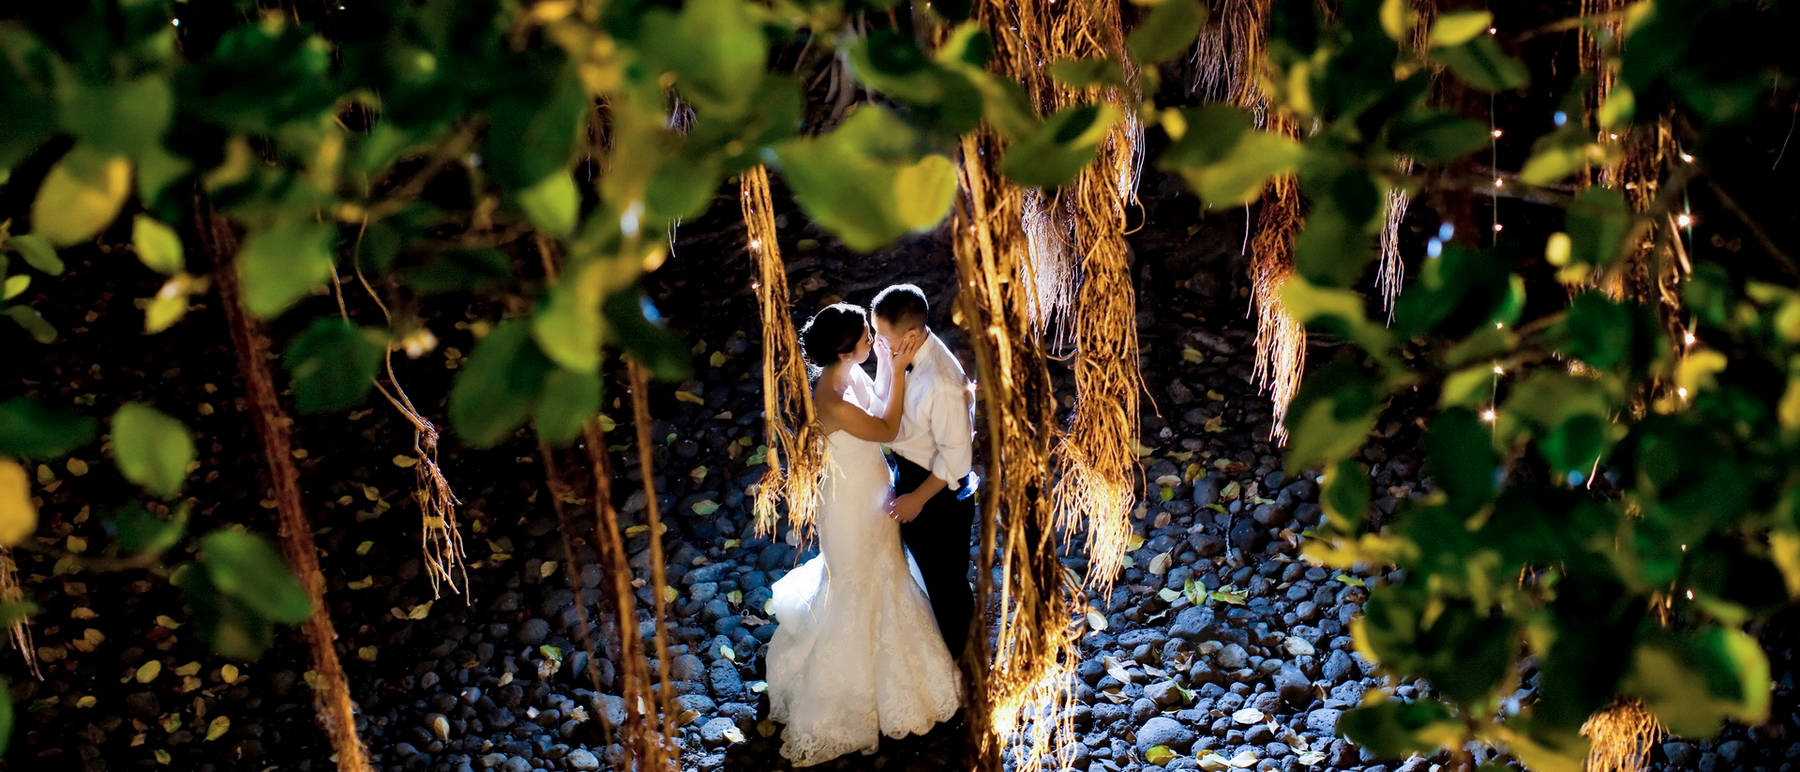 johnandjoseph-wedding-photographer-hz-slider-250